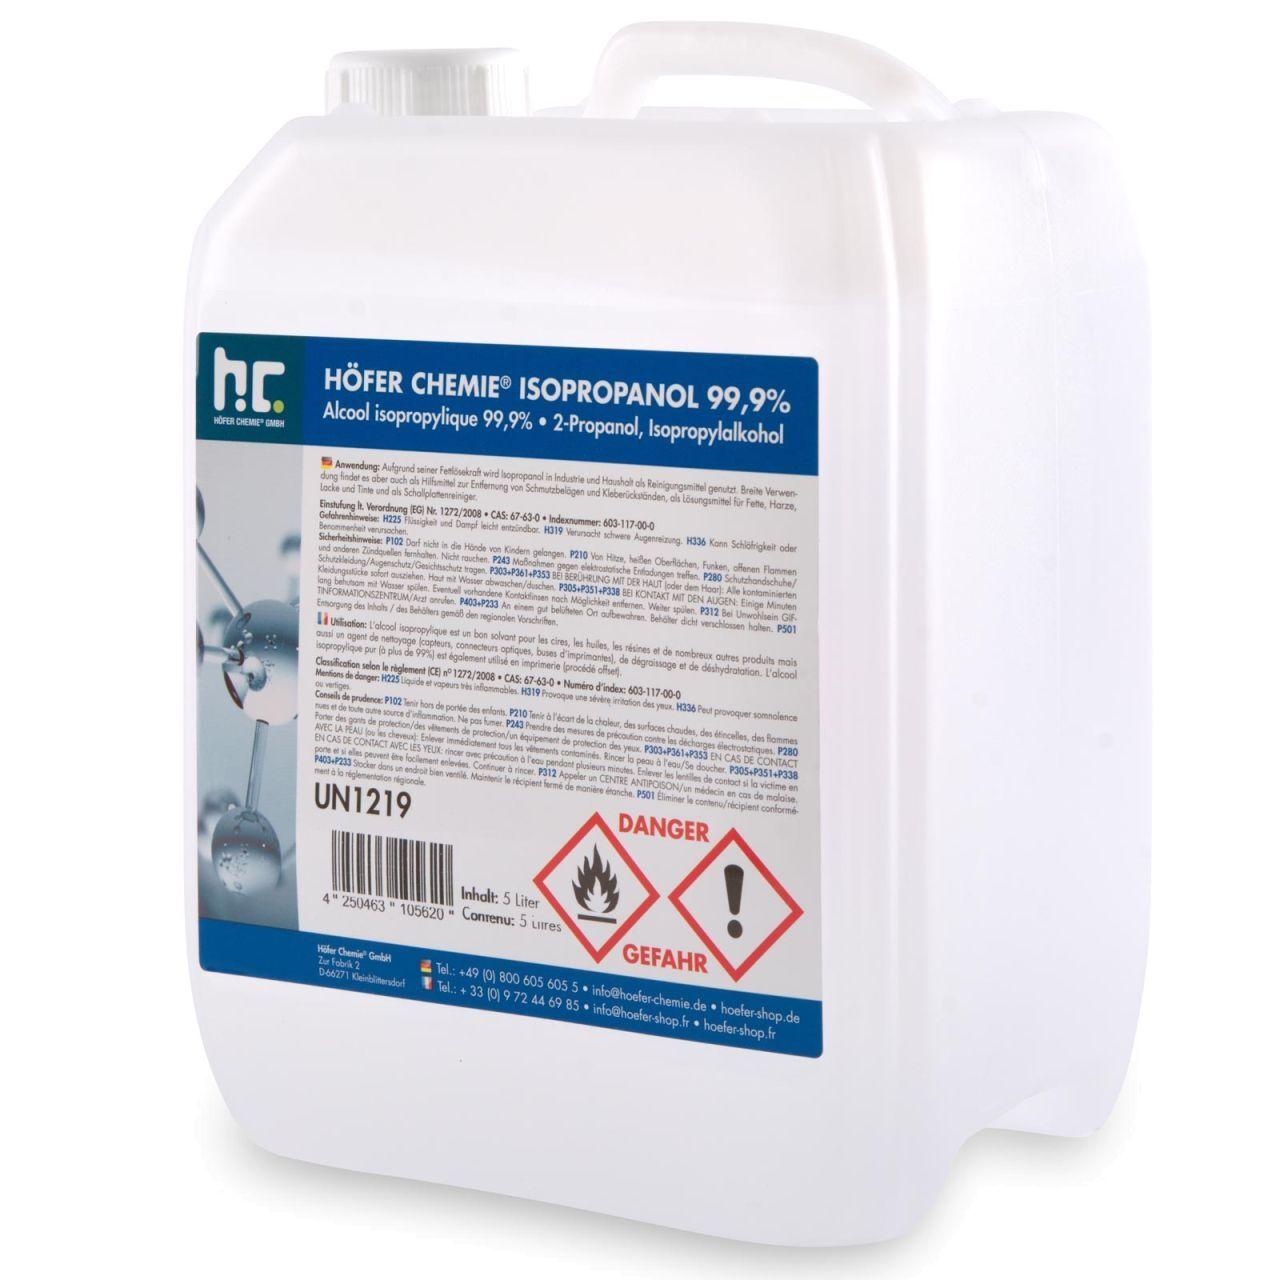 Höfer Chemie 10 l Alcool isopropylique 99,9 % (2 x 5 l)